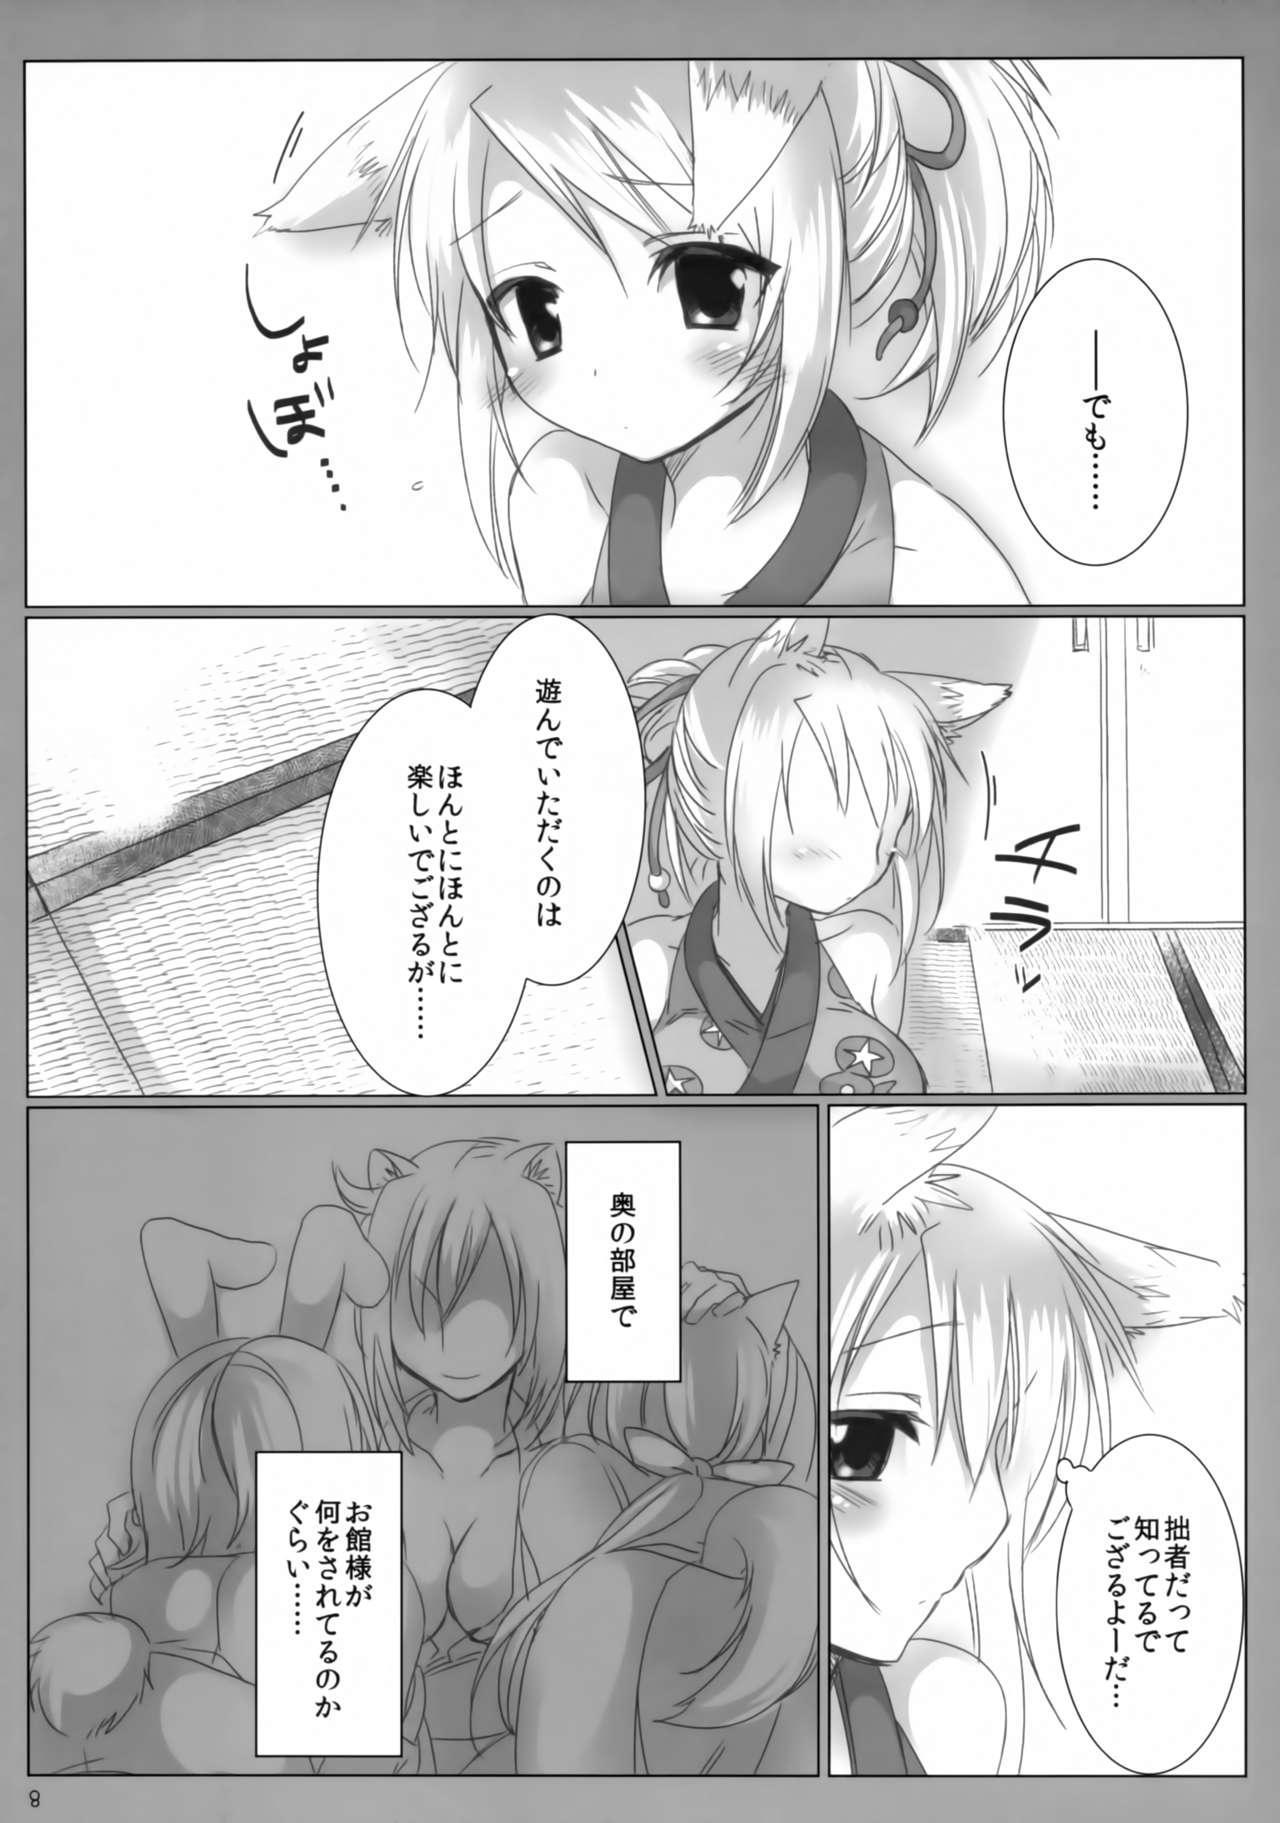 Kitsune no Hitori Asobi 6